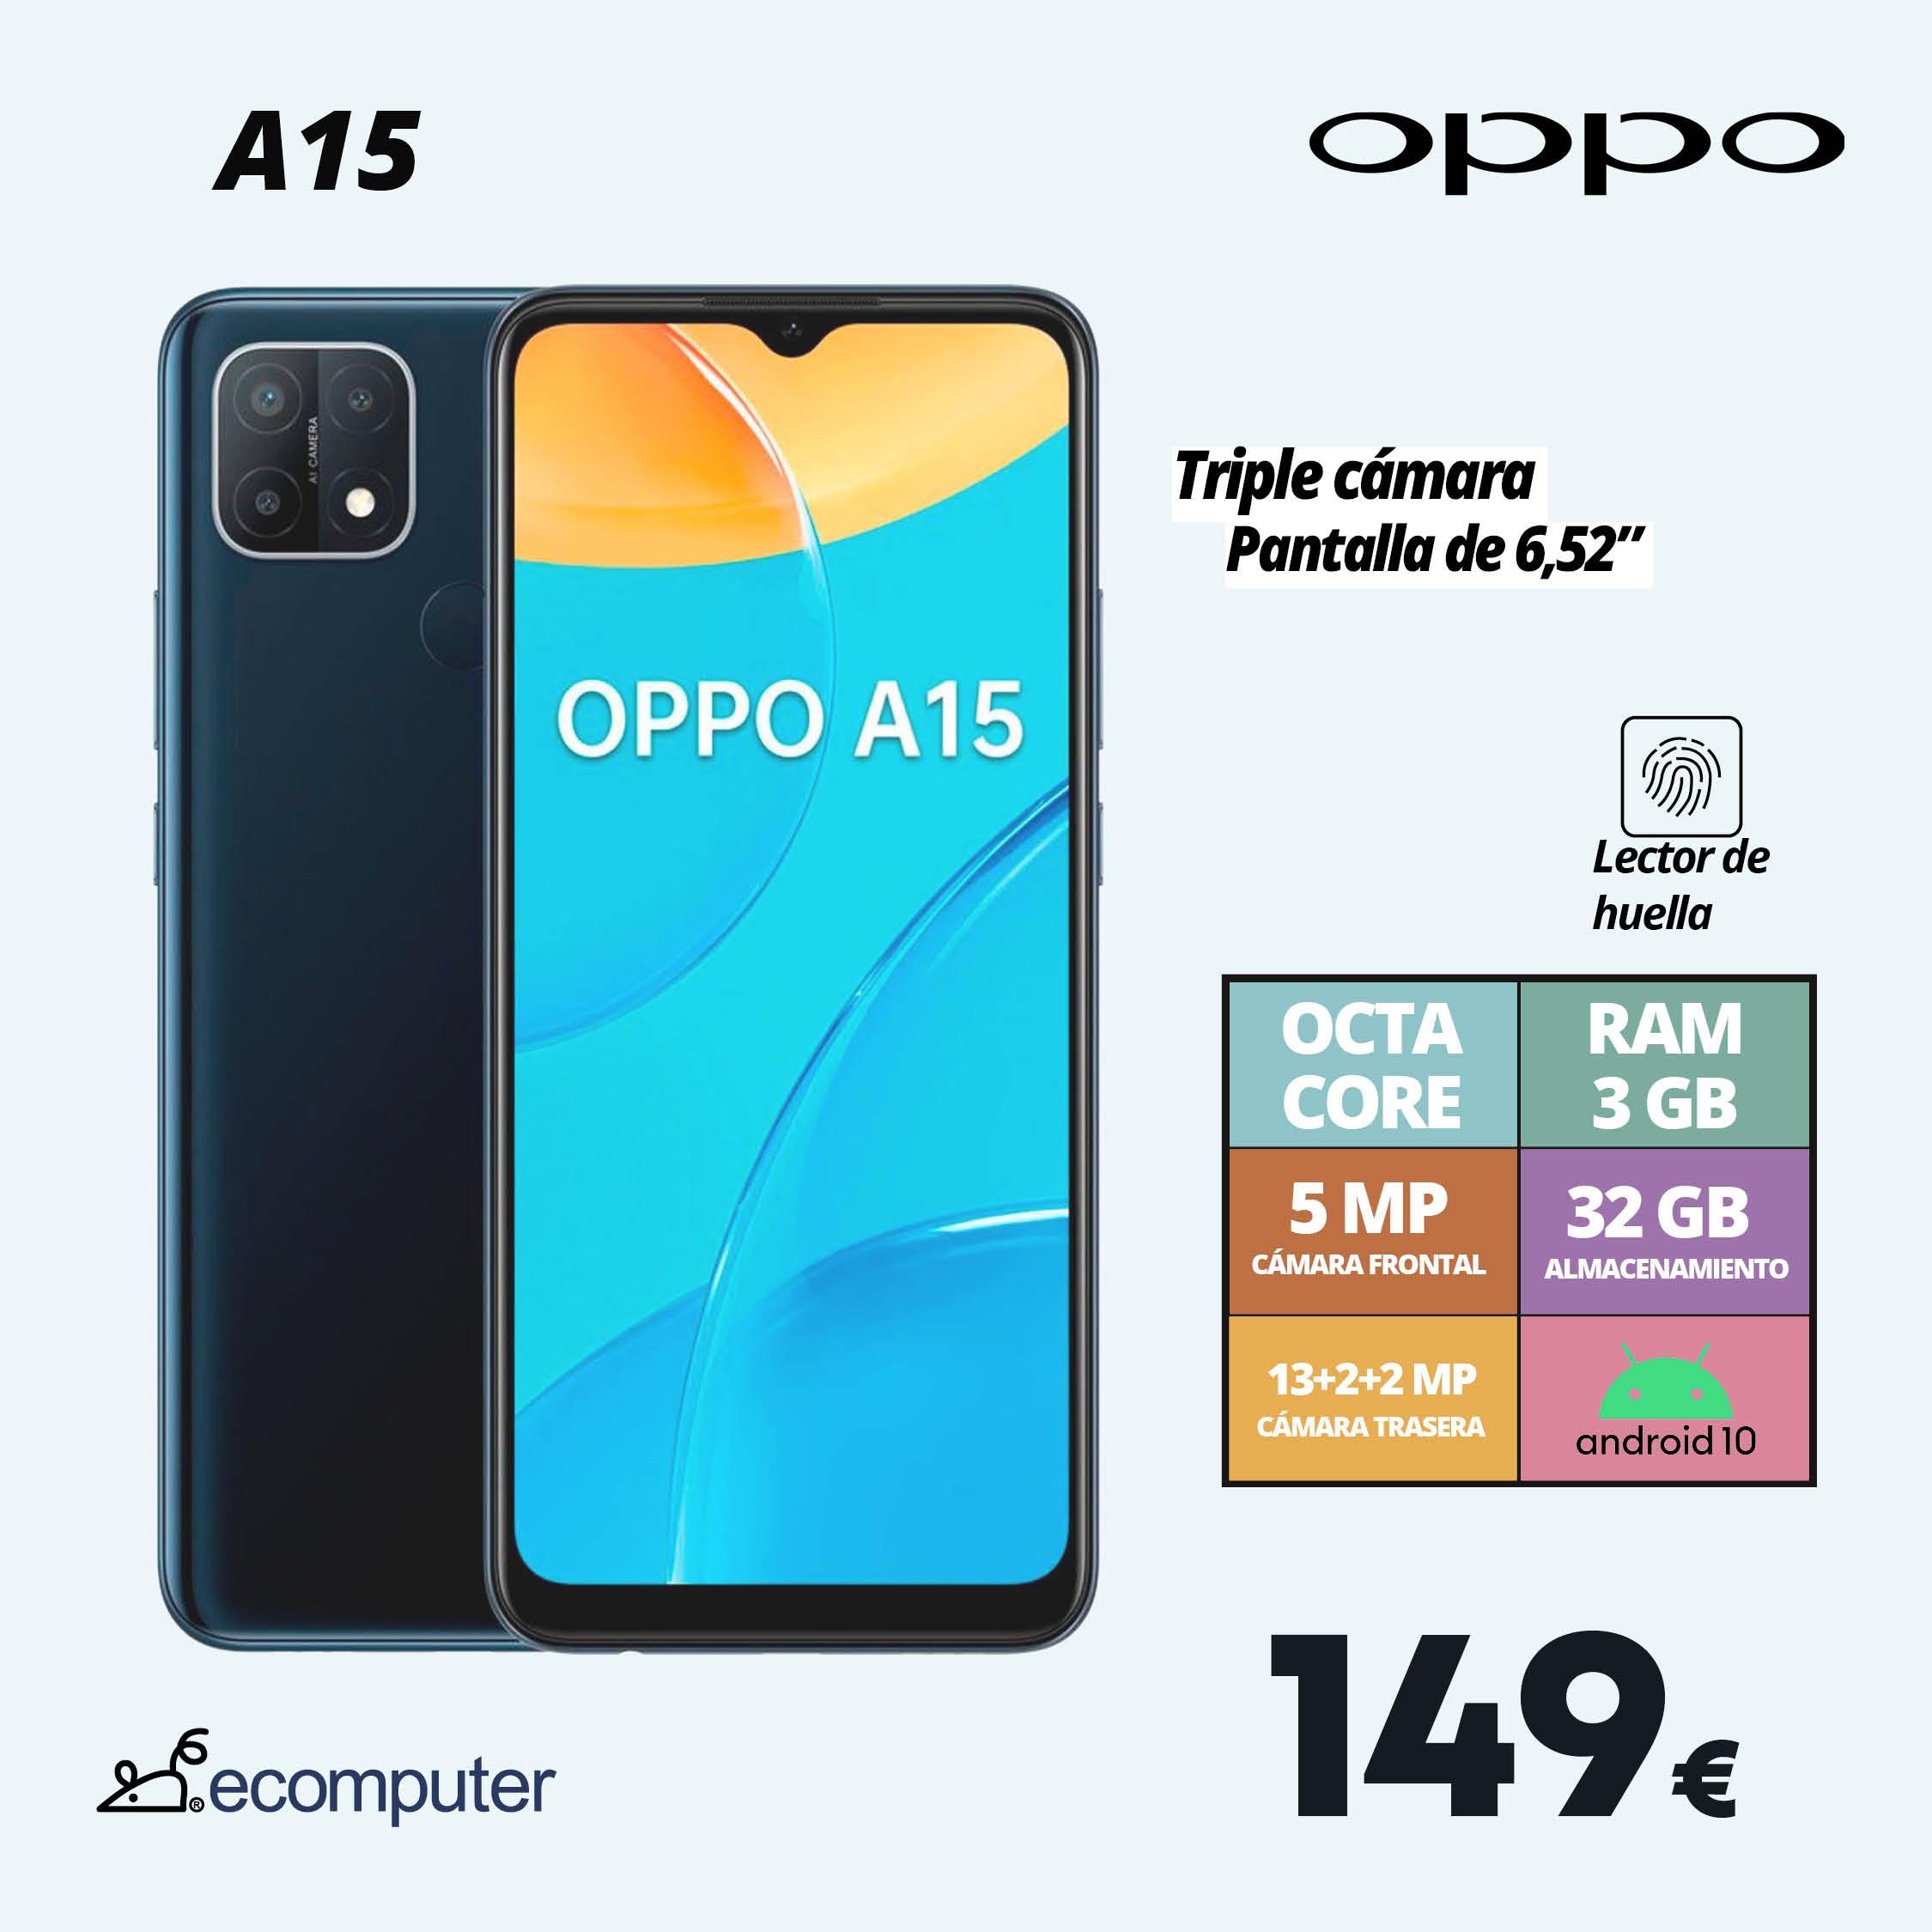 Oppo A15 smartphone